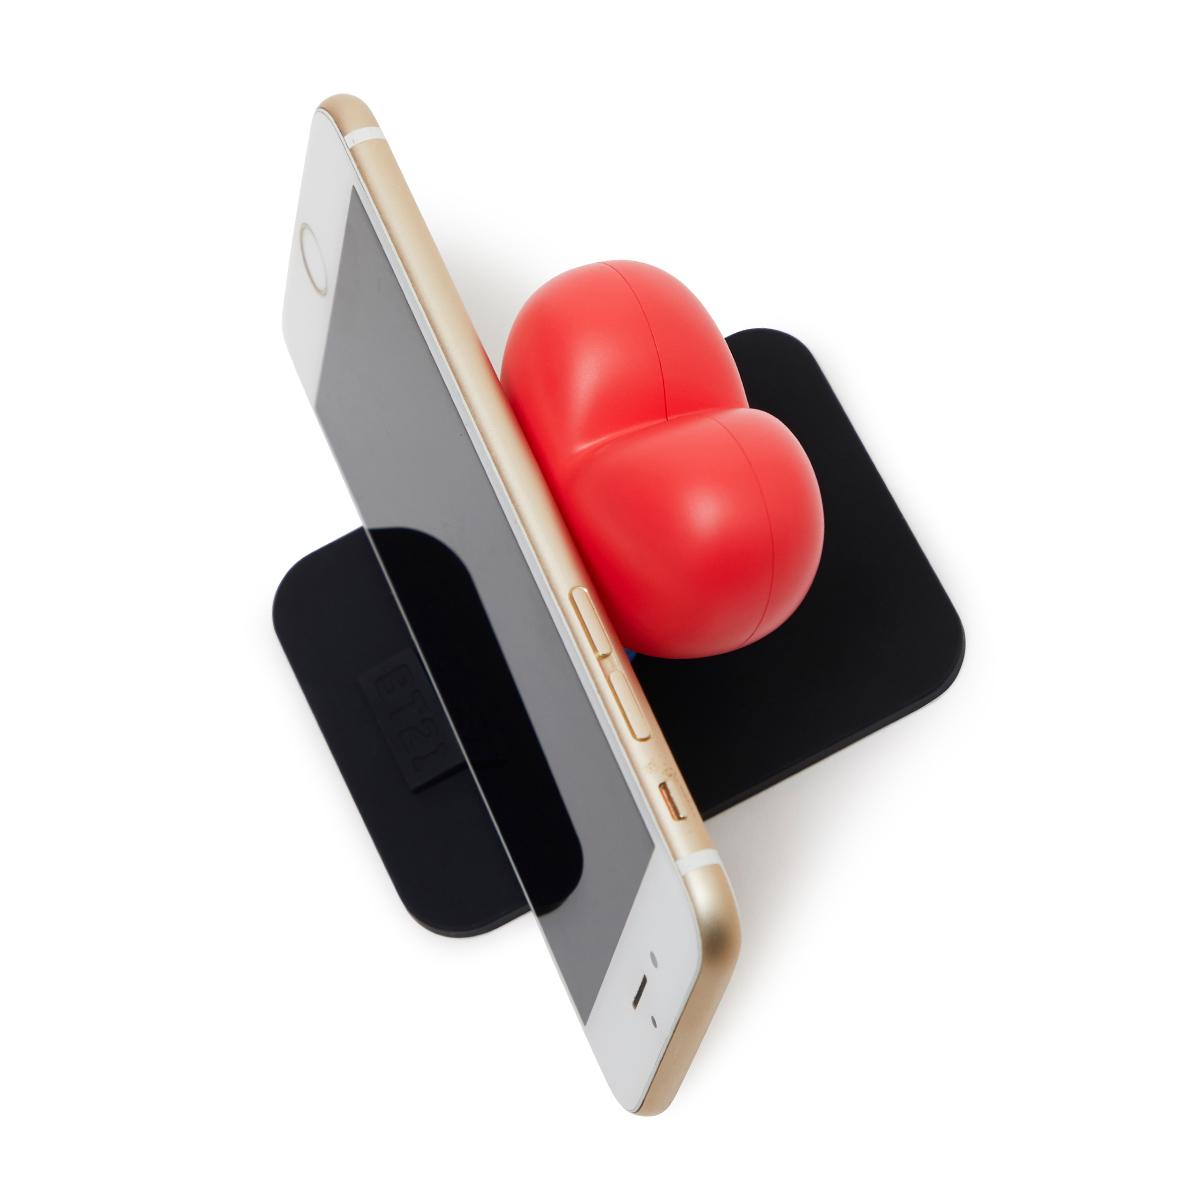 BT21 TATA 피규어 휴대폰 거치대